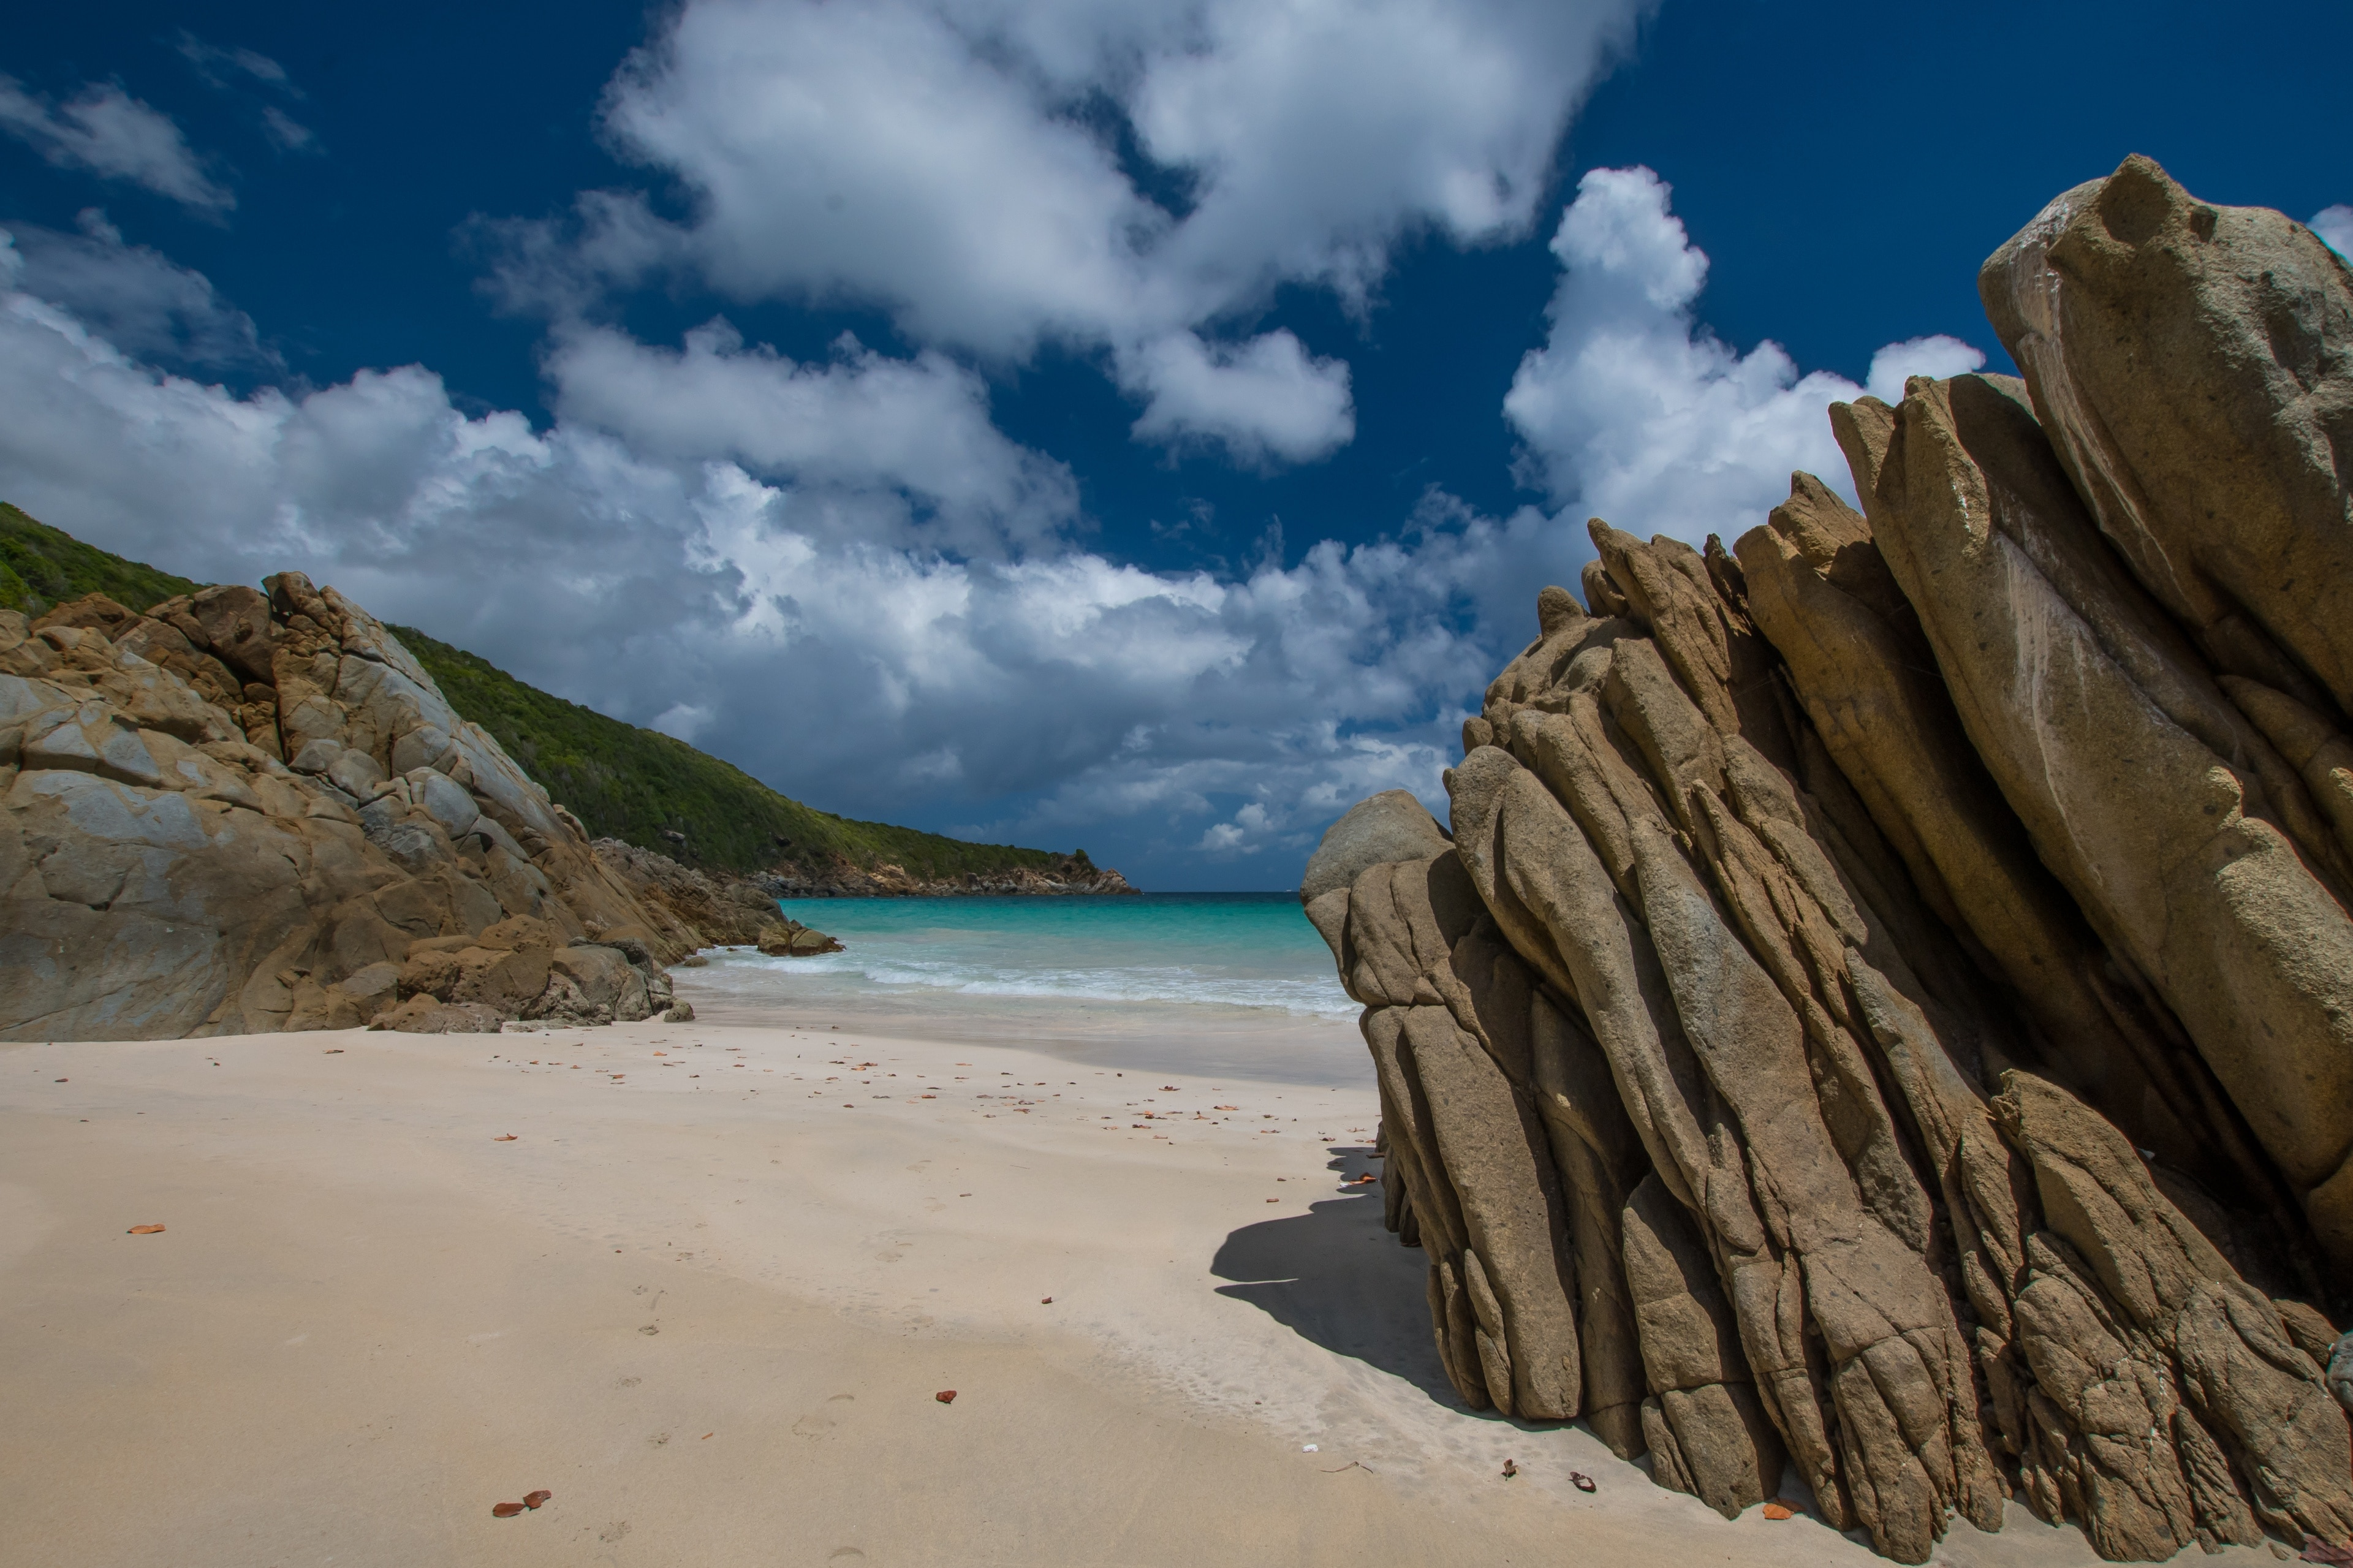 East End, Tortola, British Virgin Islands